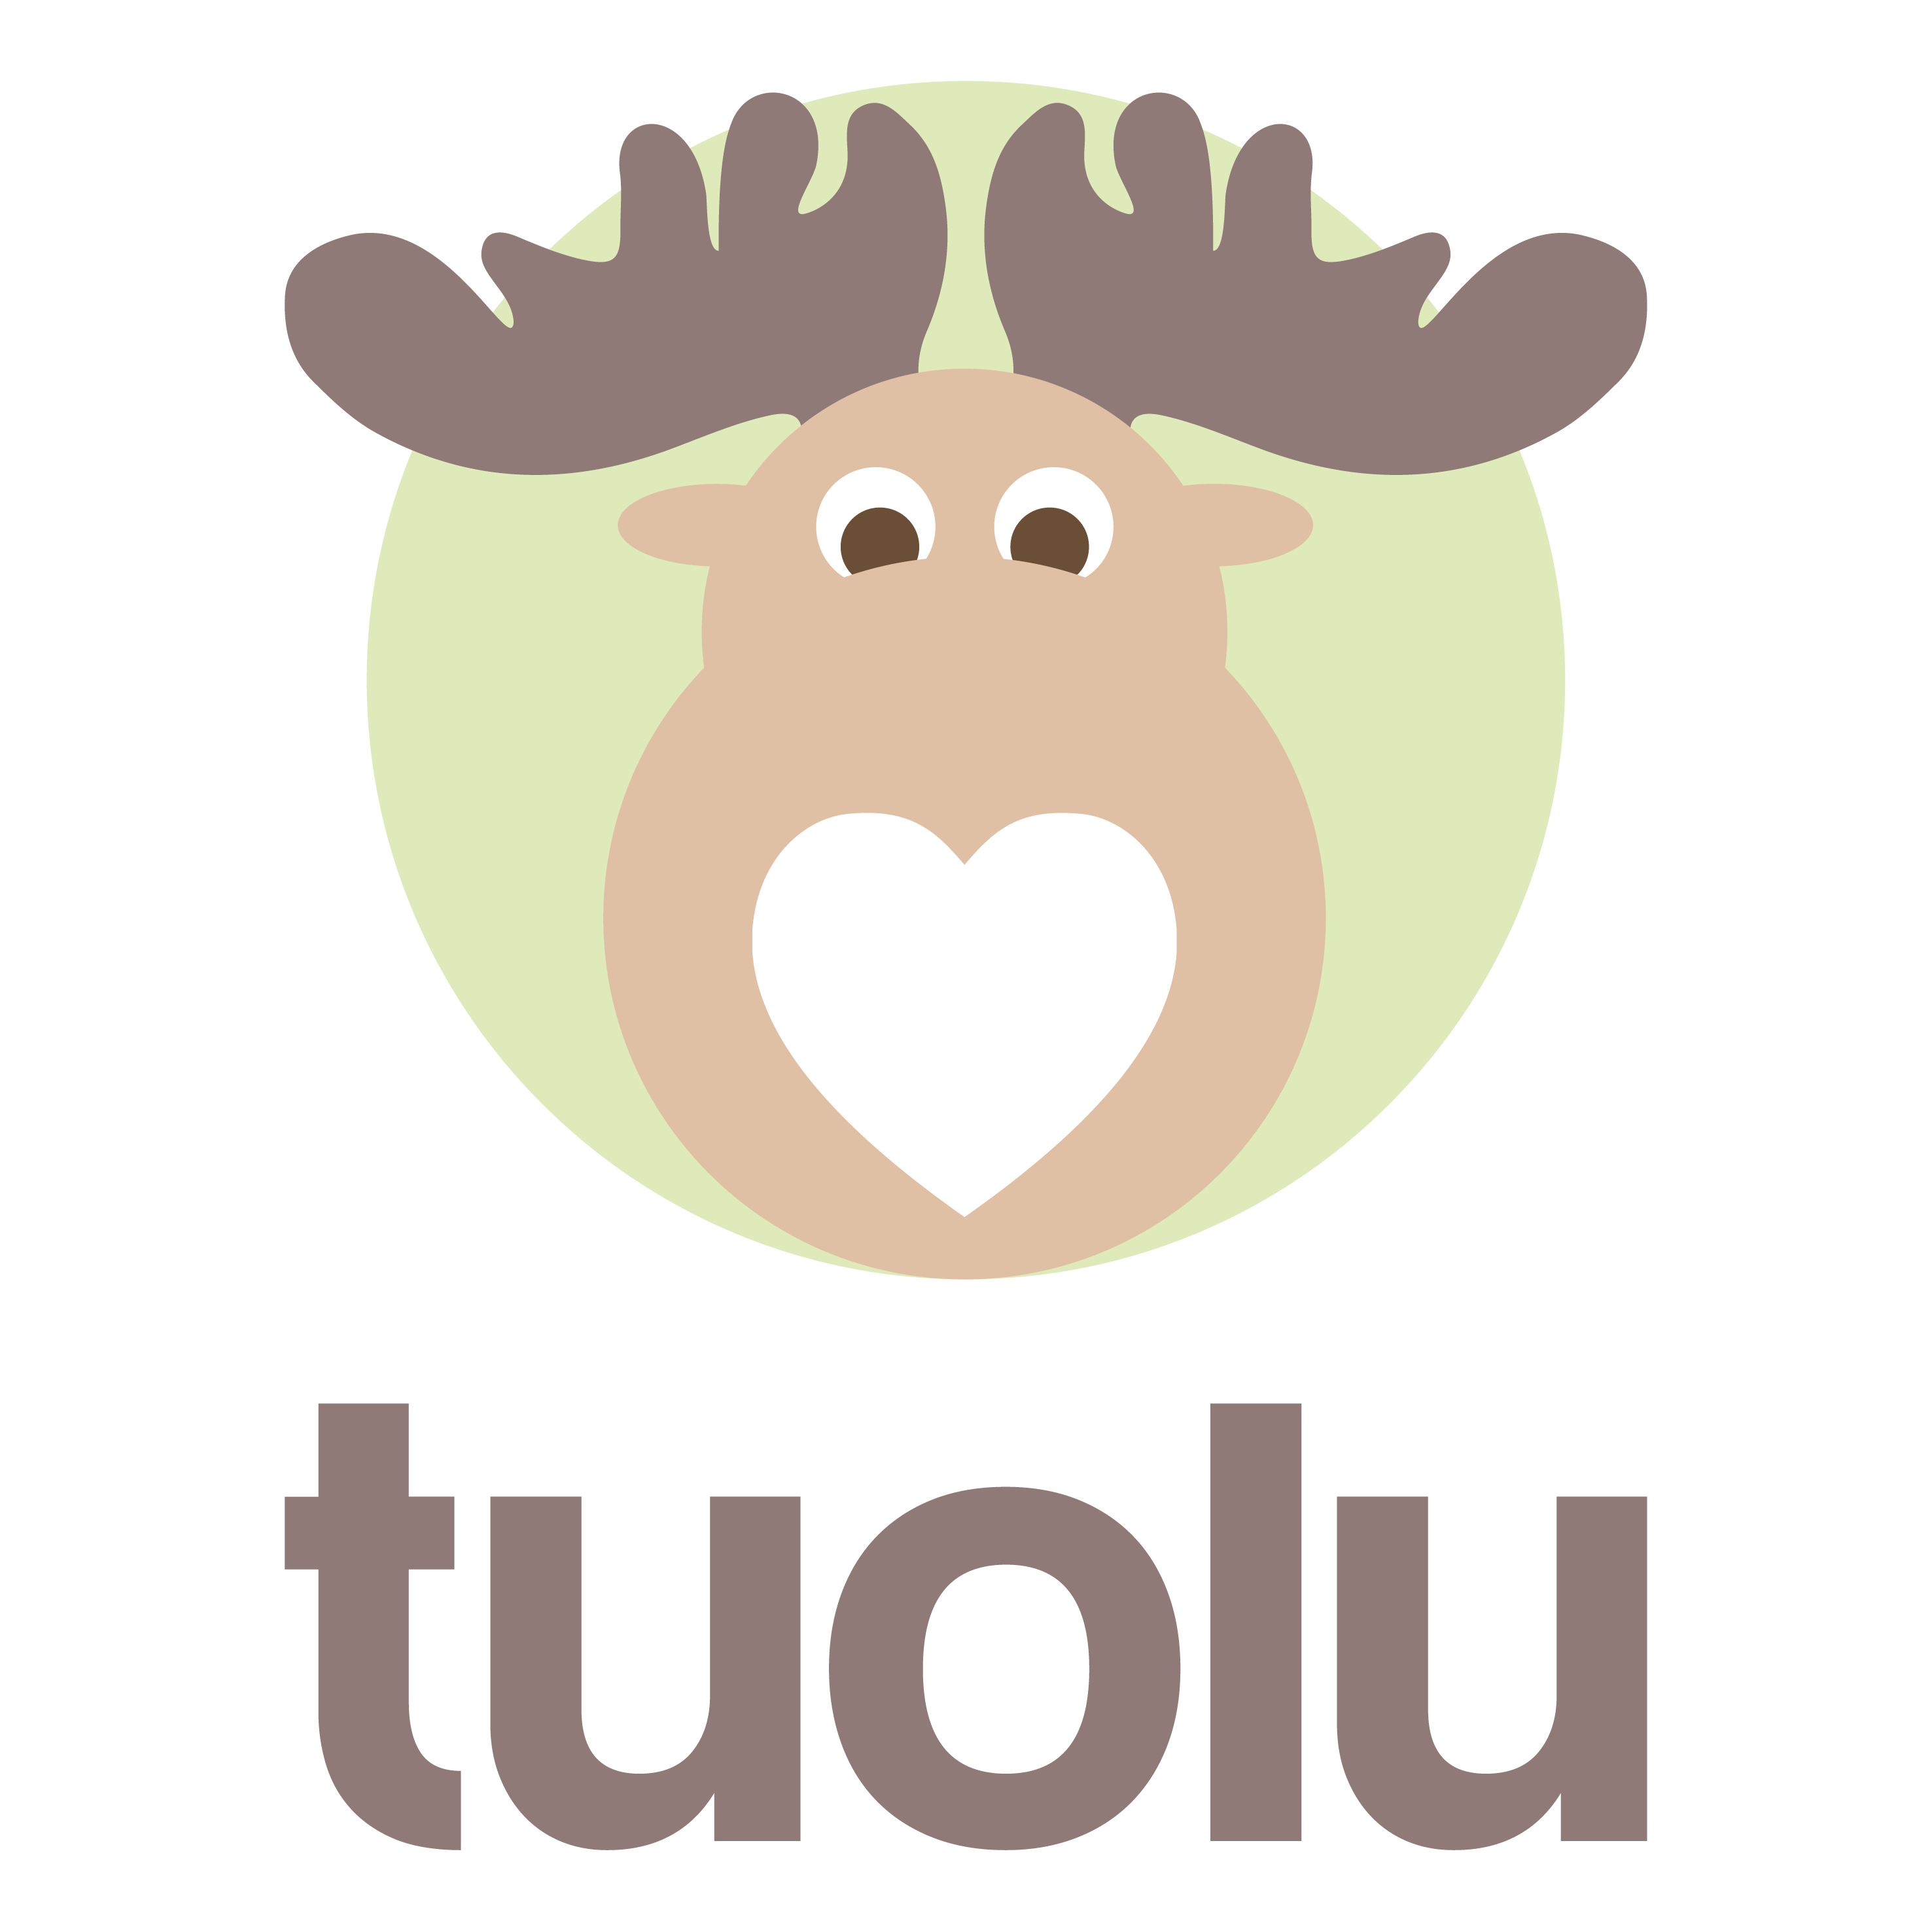 Tuolu